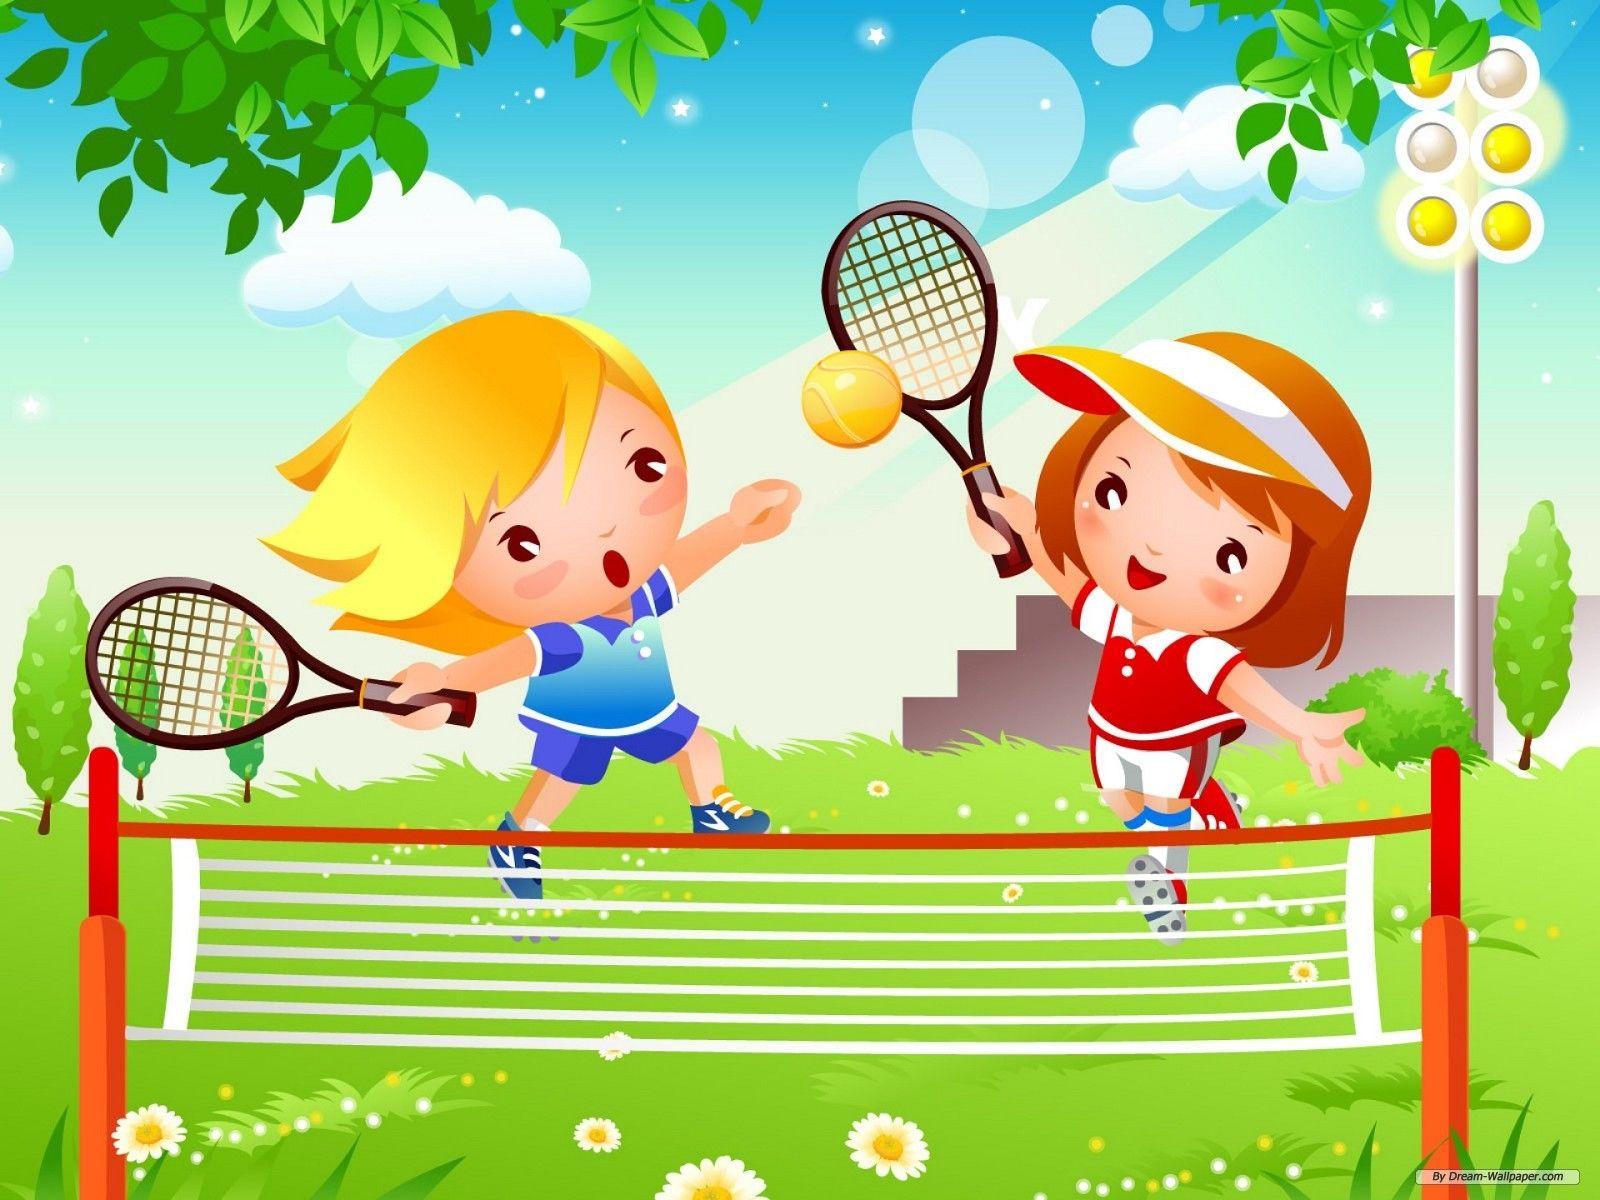 Pin By Sonja Putzeys On Sport Kids Tennis Cartoons Vector Photoshop Wallpapers